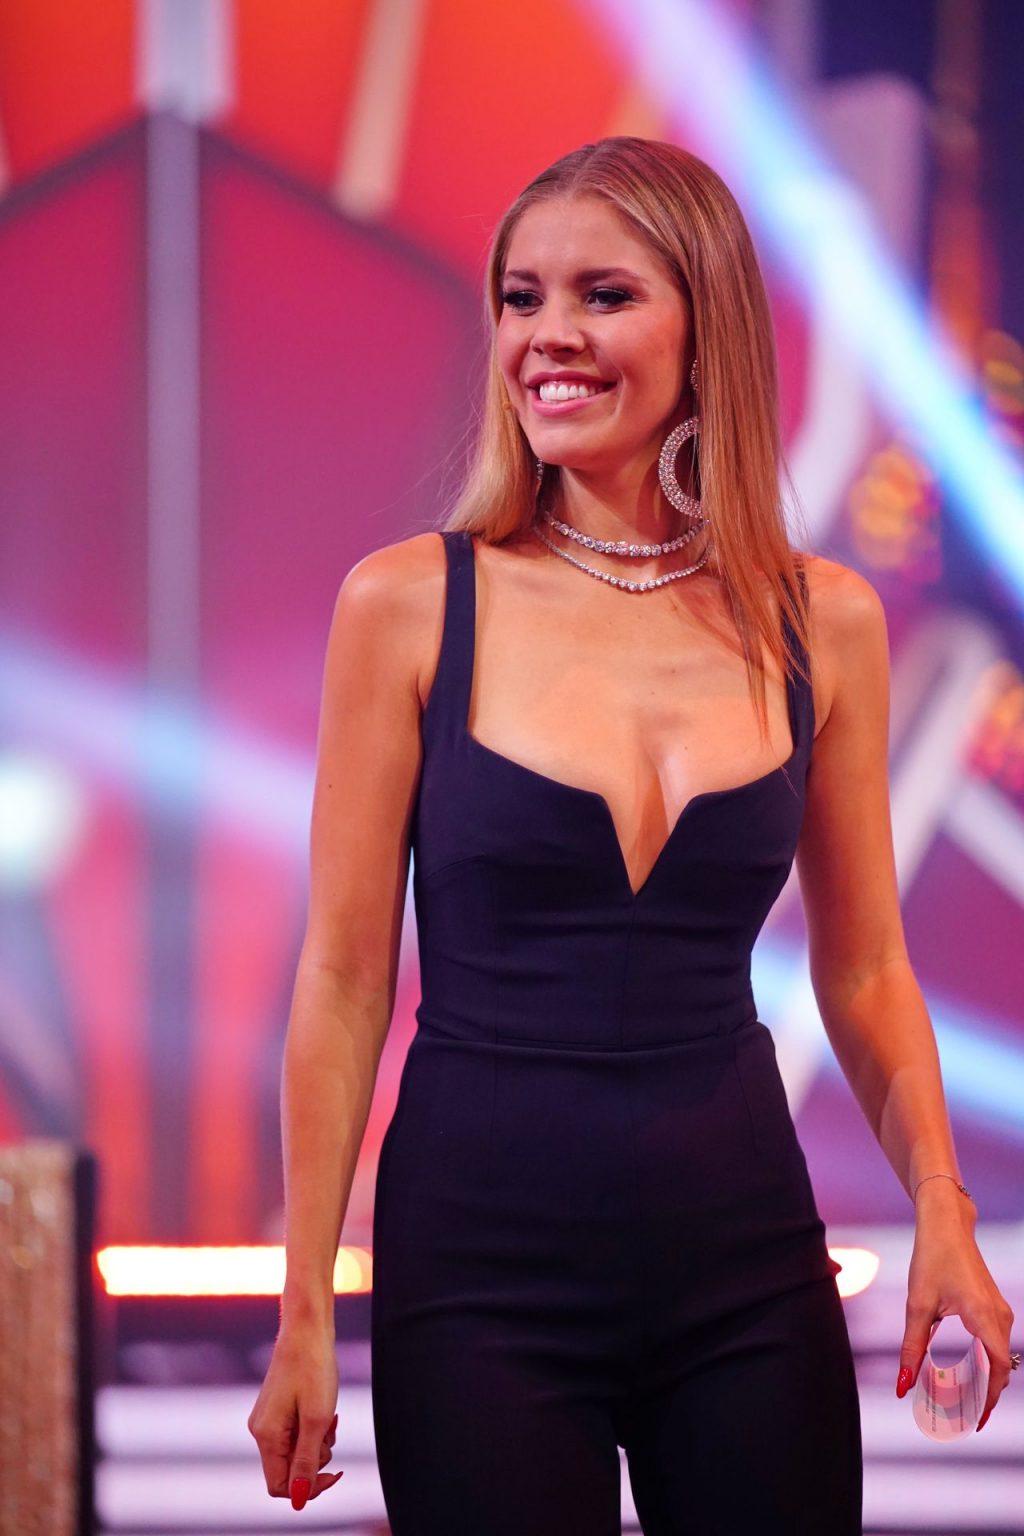 Victoria Swarovski Sexy - #TheFappening